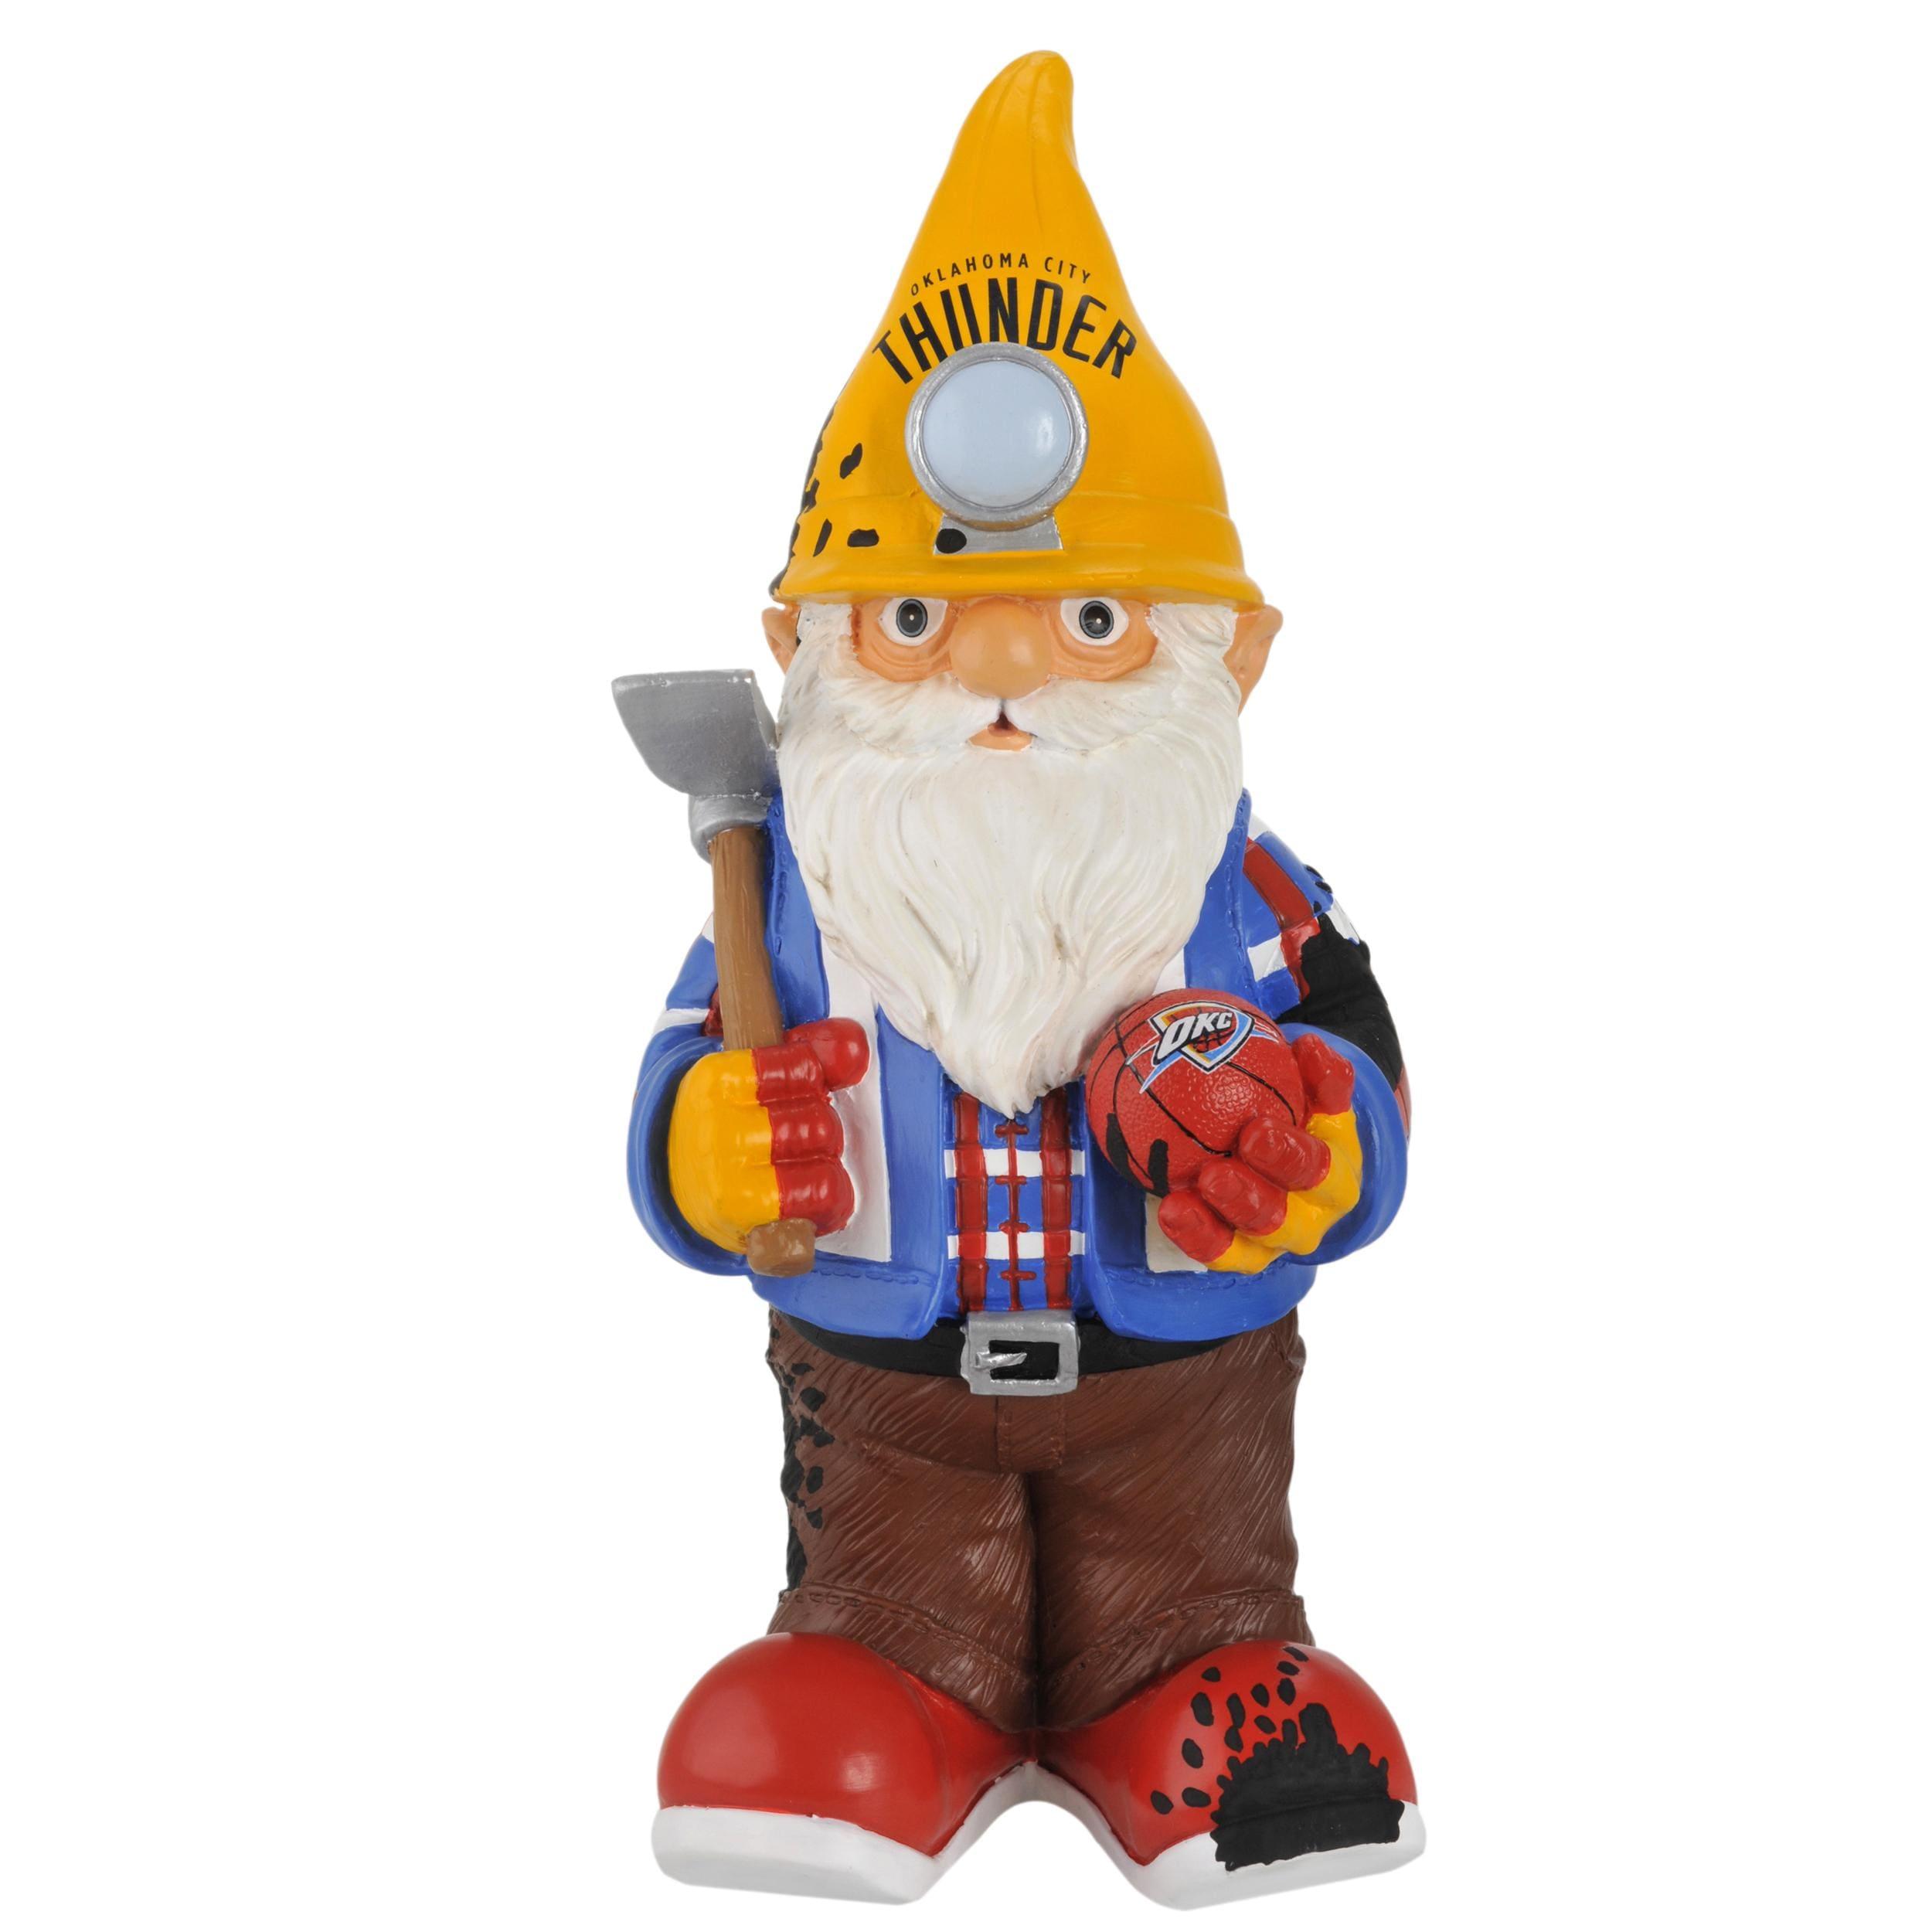 Oklahoma City Thunder 11-inch Thematic Garden Gnome - Thumbnail 2